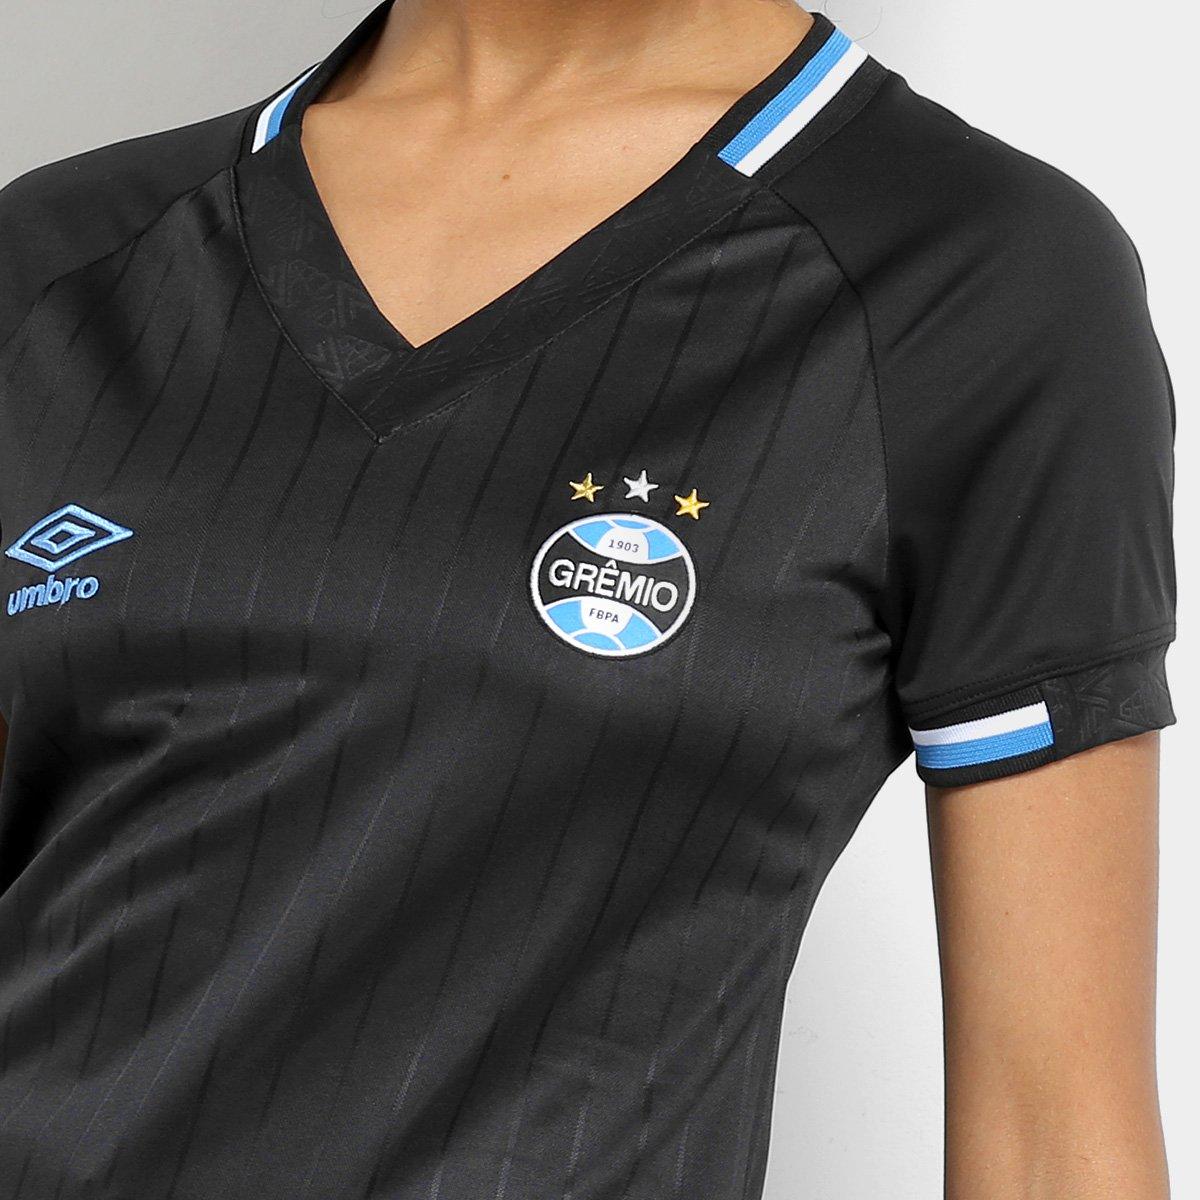 Camisa Grêmio III 2018 s n° Torcedor Umbro Feminina - Preto e Branco ... 35e07d2dd22a8